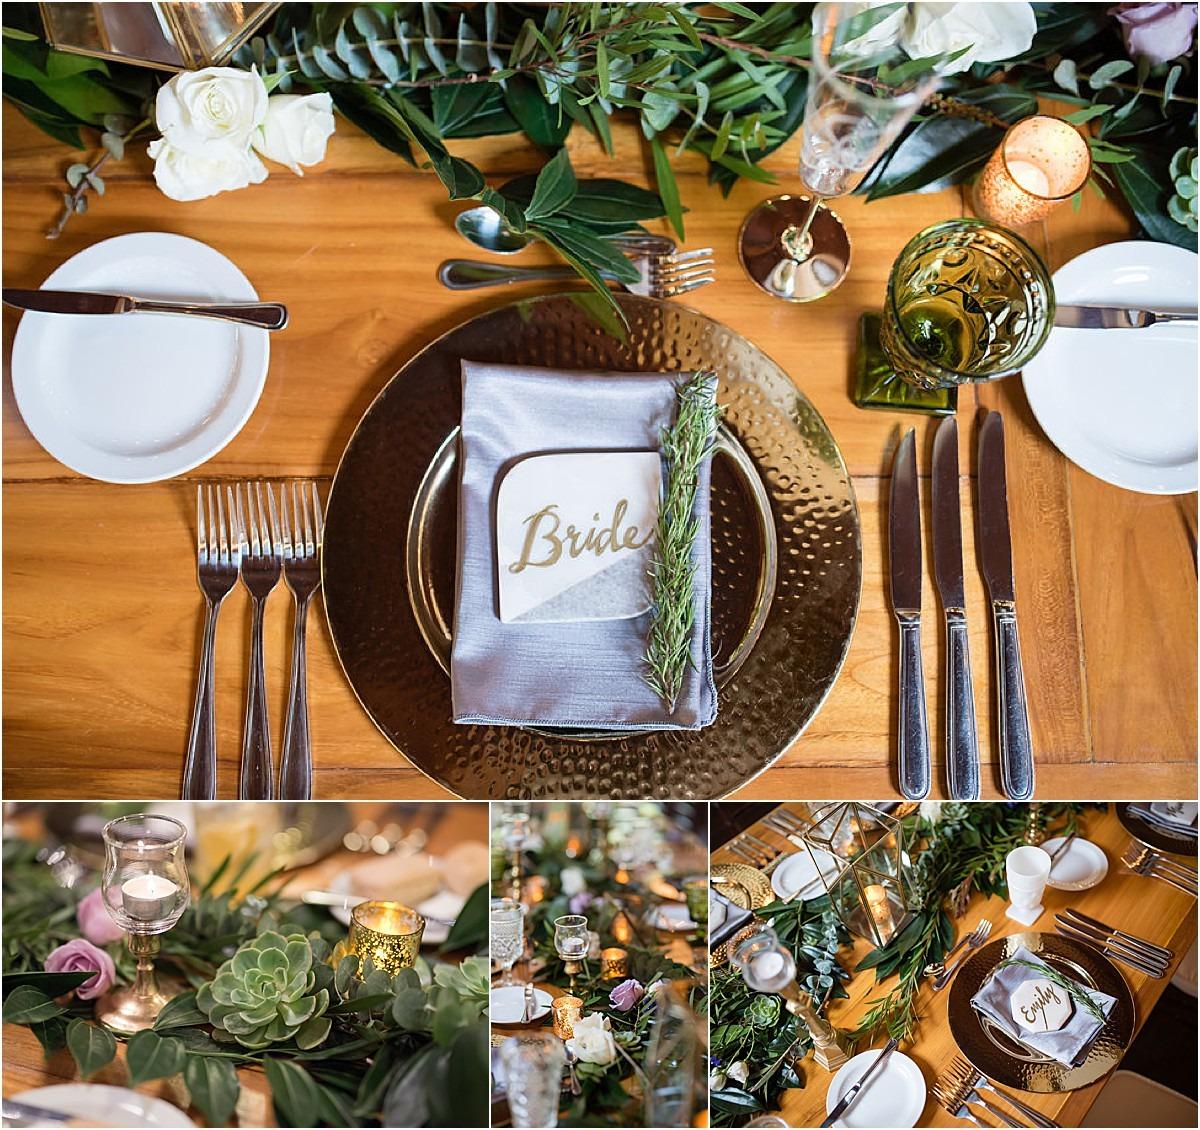 bride table name cute decor